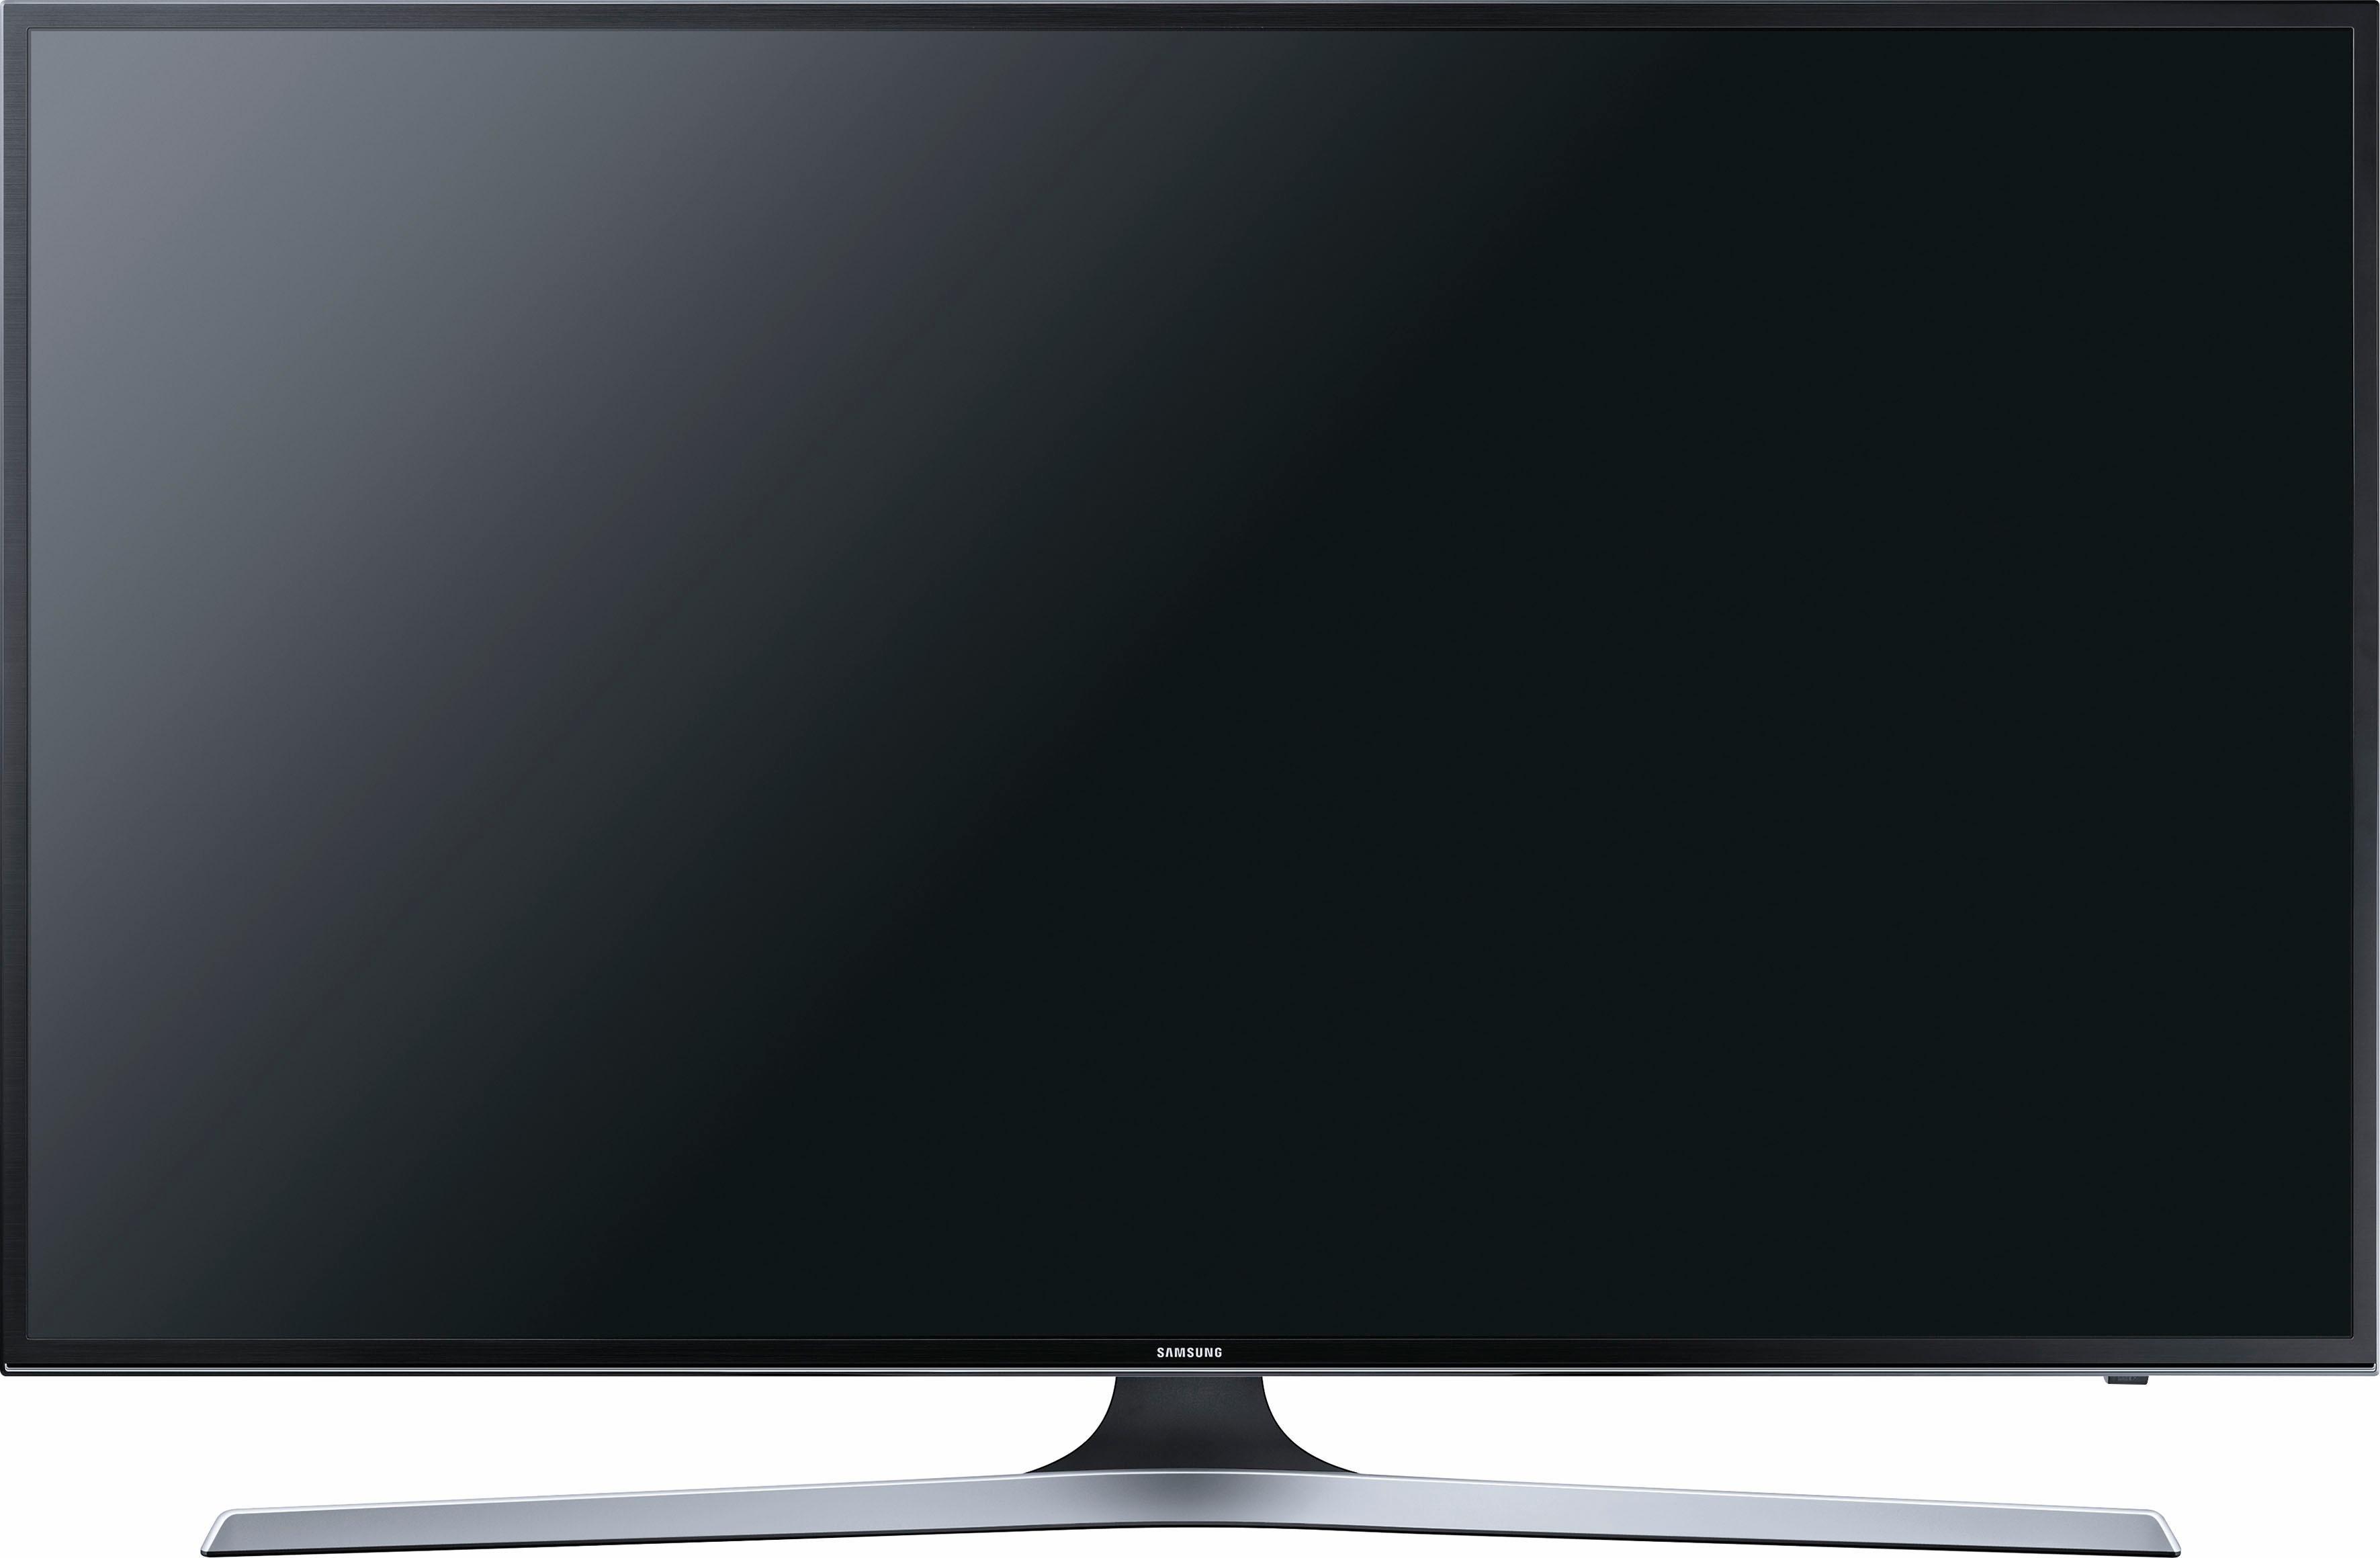 samsung ue40mu6179uxzg led tv 101 cm 40 inch uhd 4k smart tv online bestellen otto. Black Bedroom Furniture Sets. Home Design Ideas